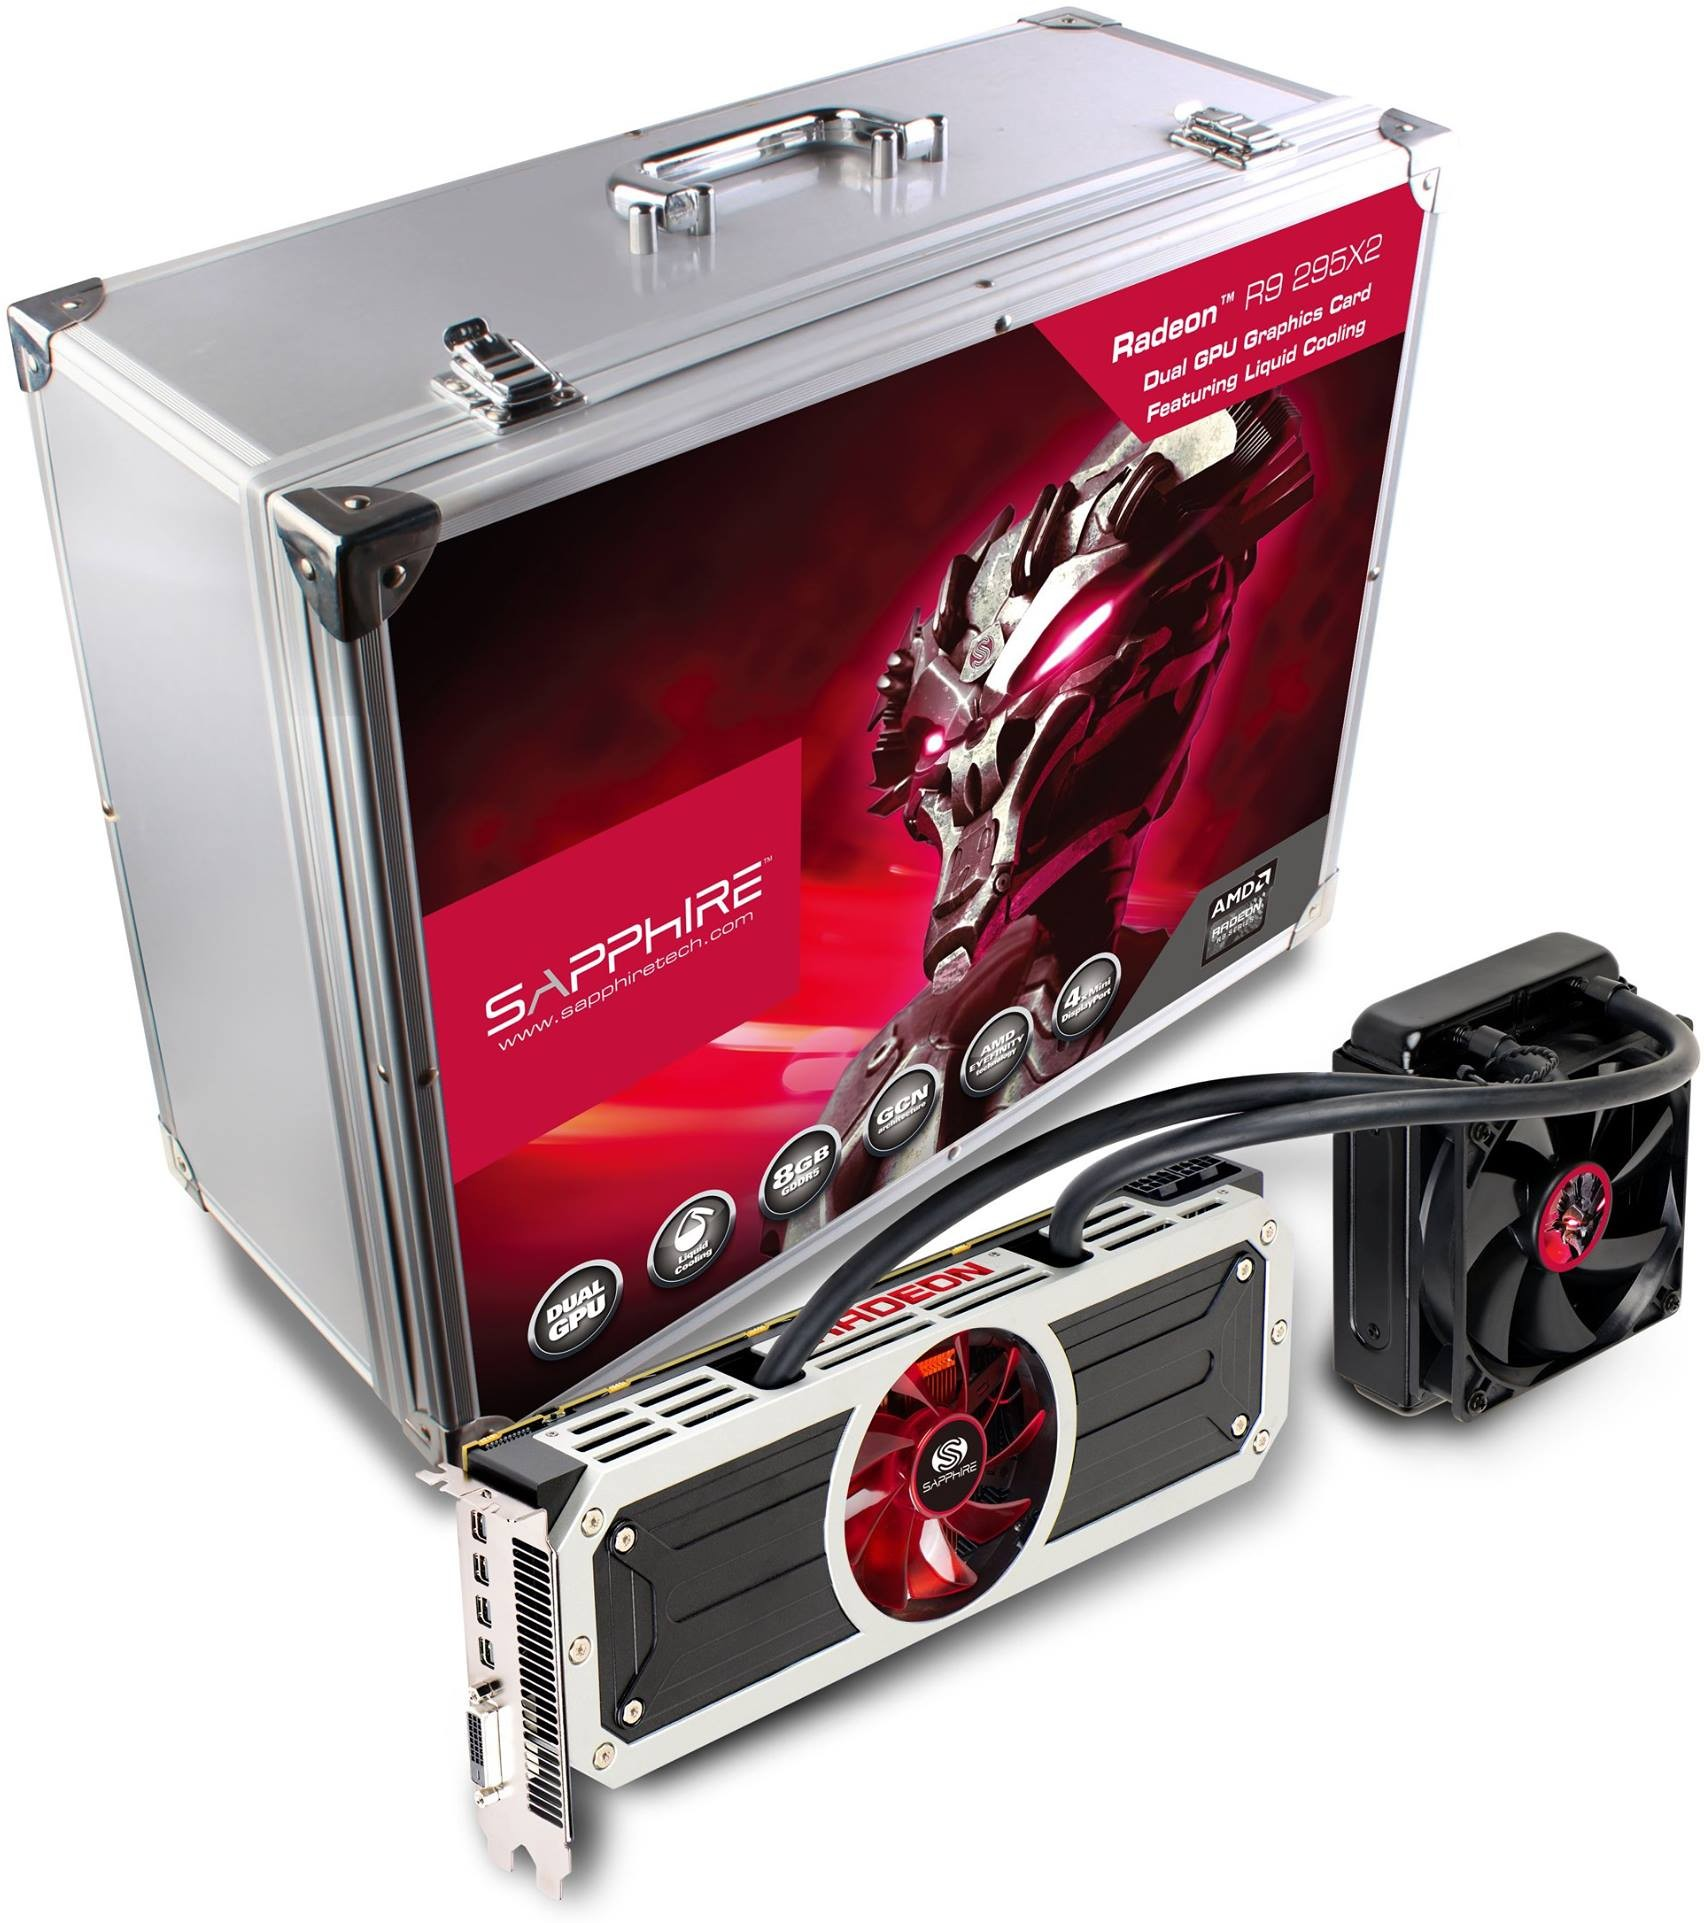 Sapphire Releases Radeon R9 295 X2 Dual-GPU Graphics Card, Briefcase